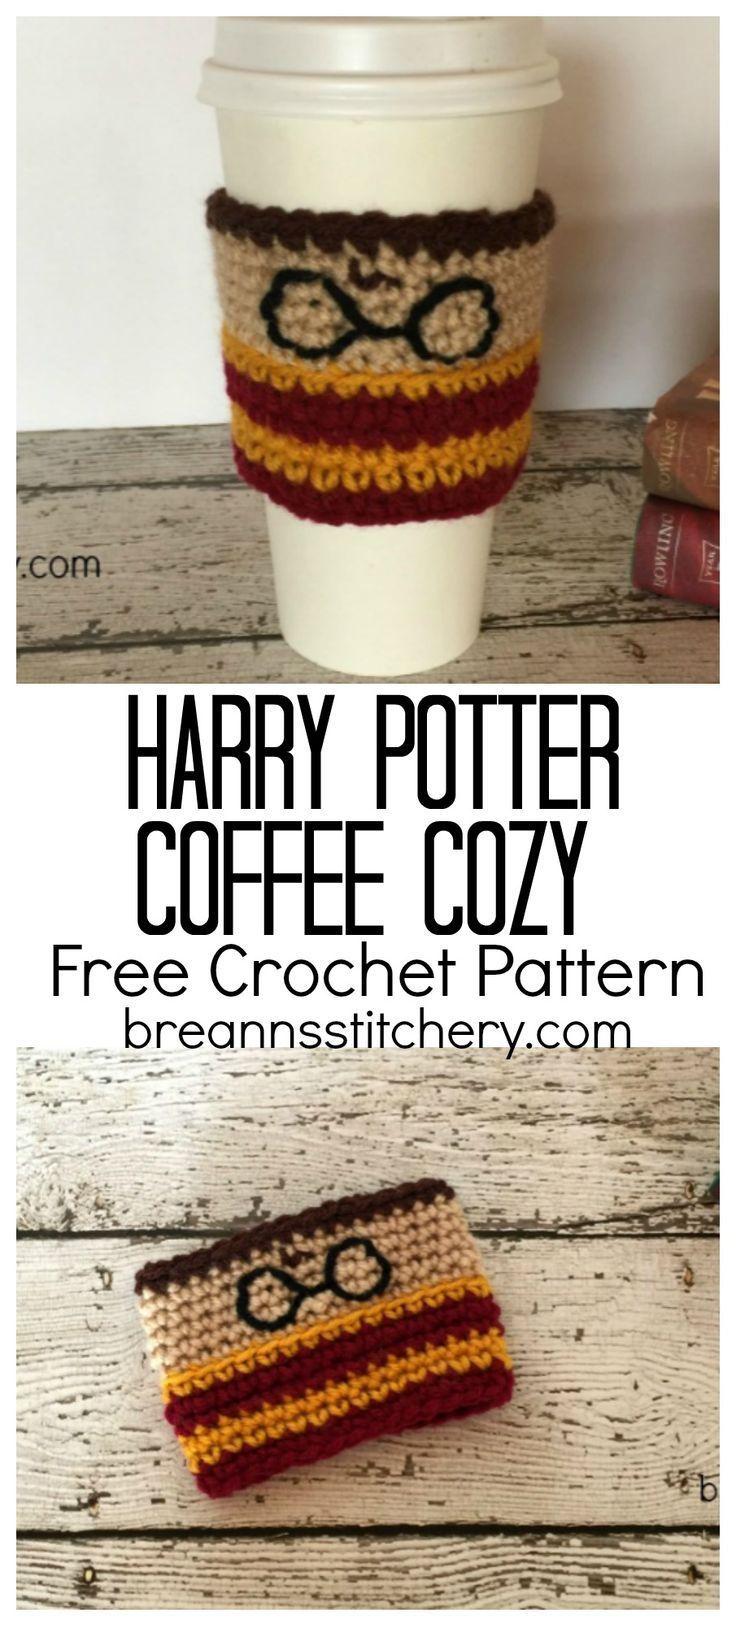 Harry Potter Crochet Coffee Cozy Coffee Koozies Pinterest